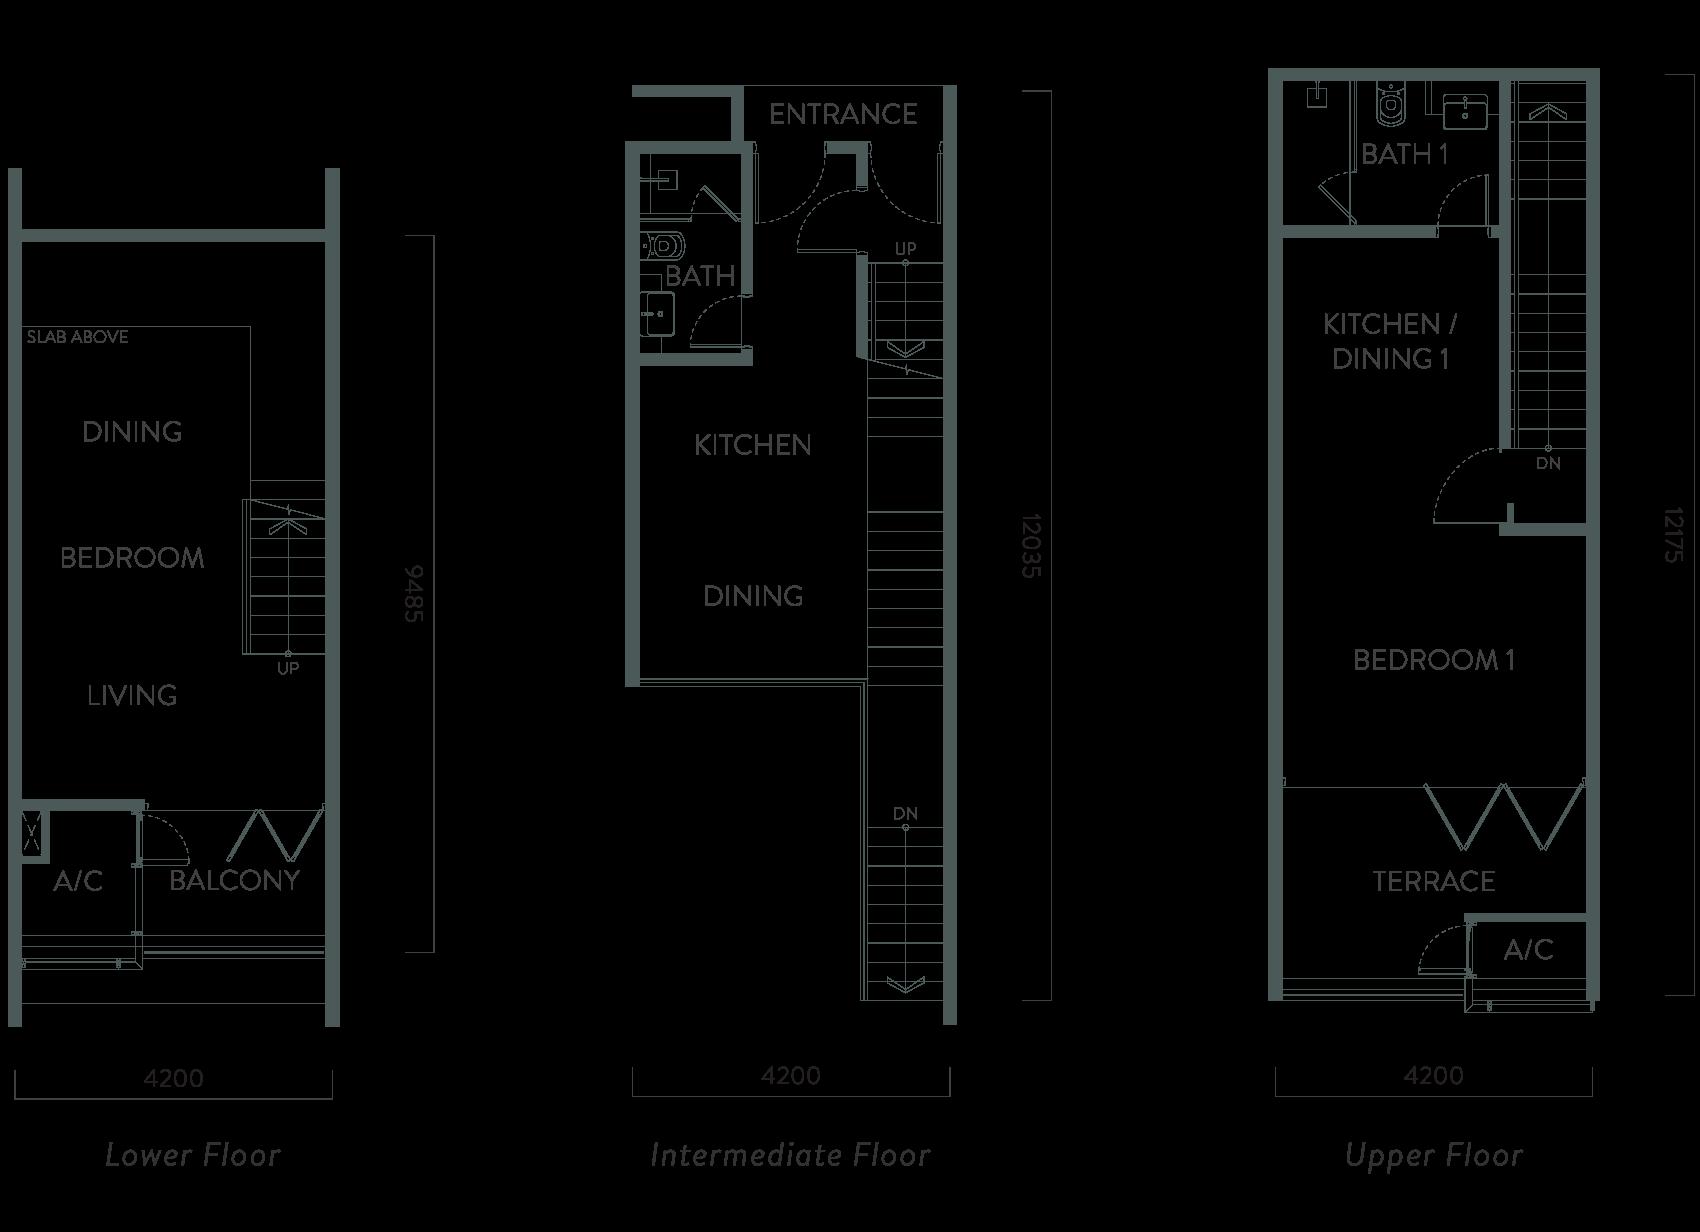 TS3a Floorplan